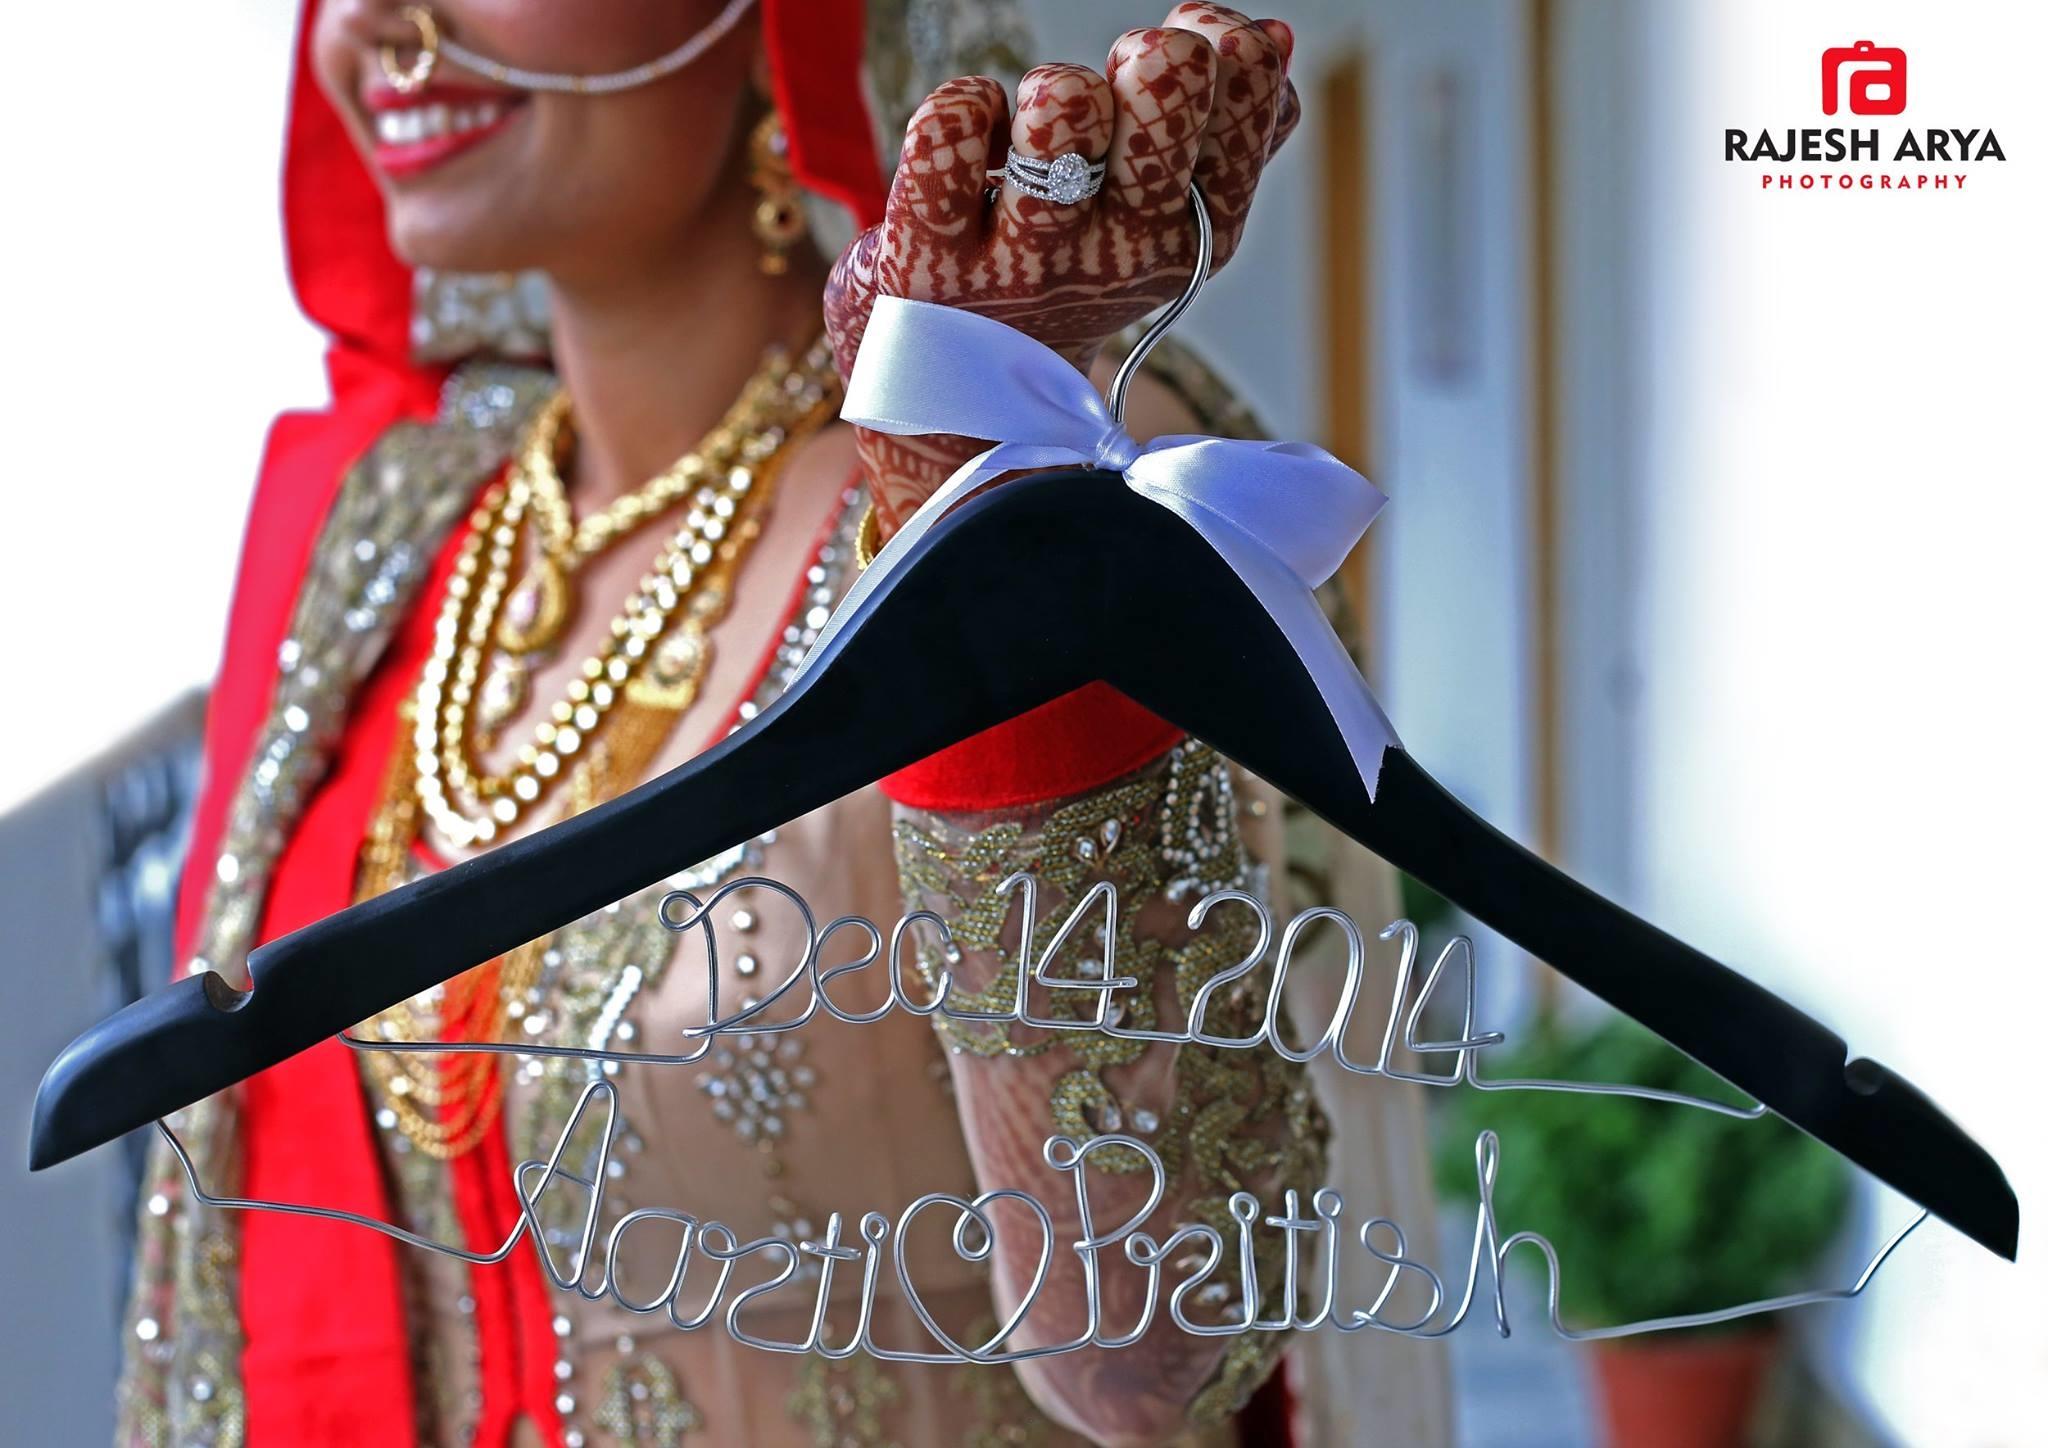 Rajesh Arya Photography